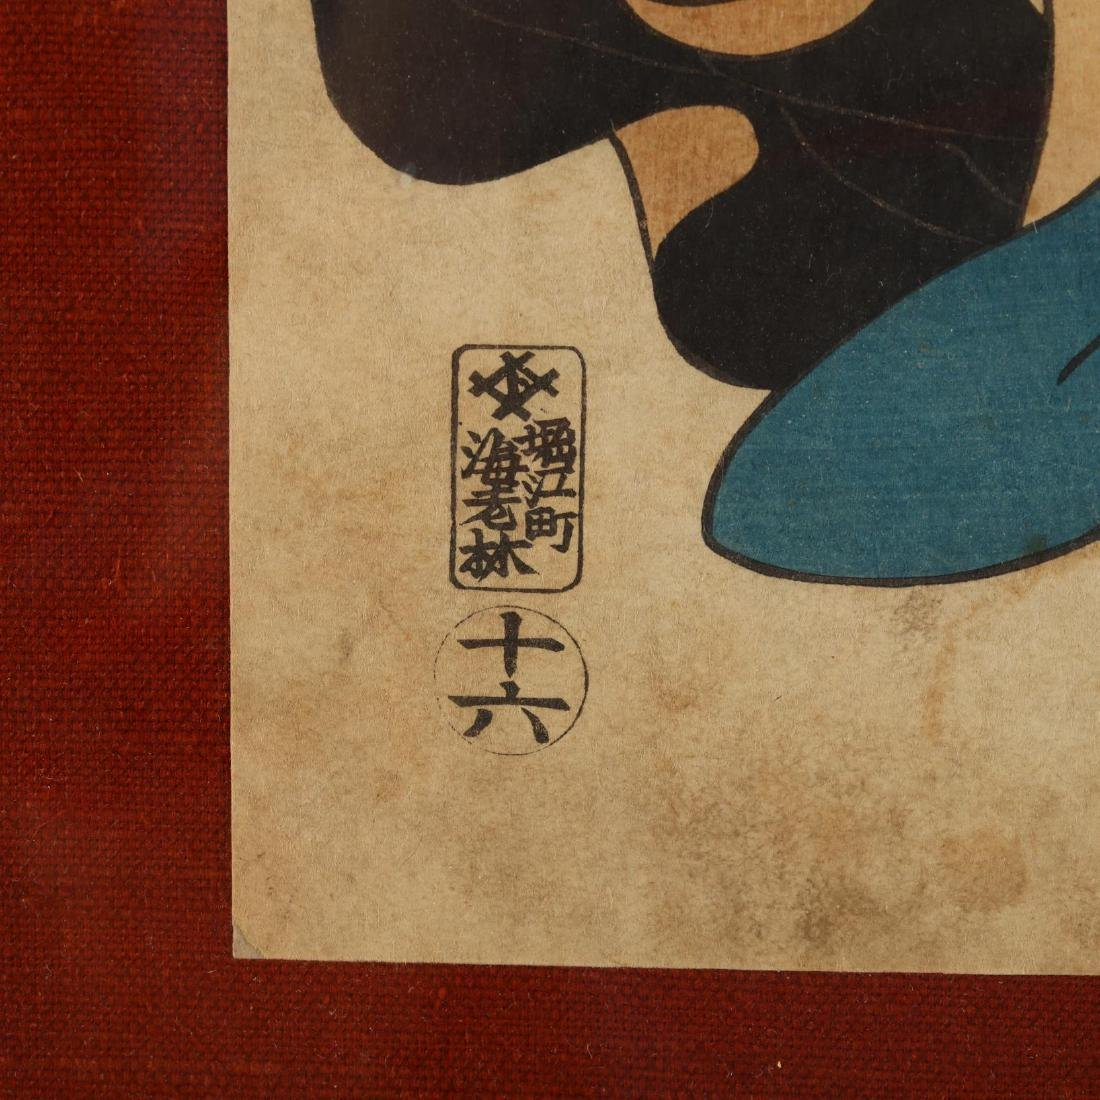 Two Japanese Woodblock Prints by Kunisada and Kuniyoshi - 3